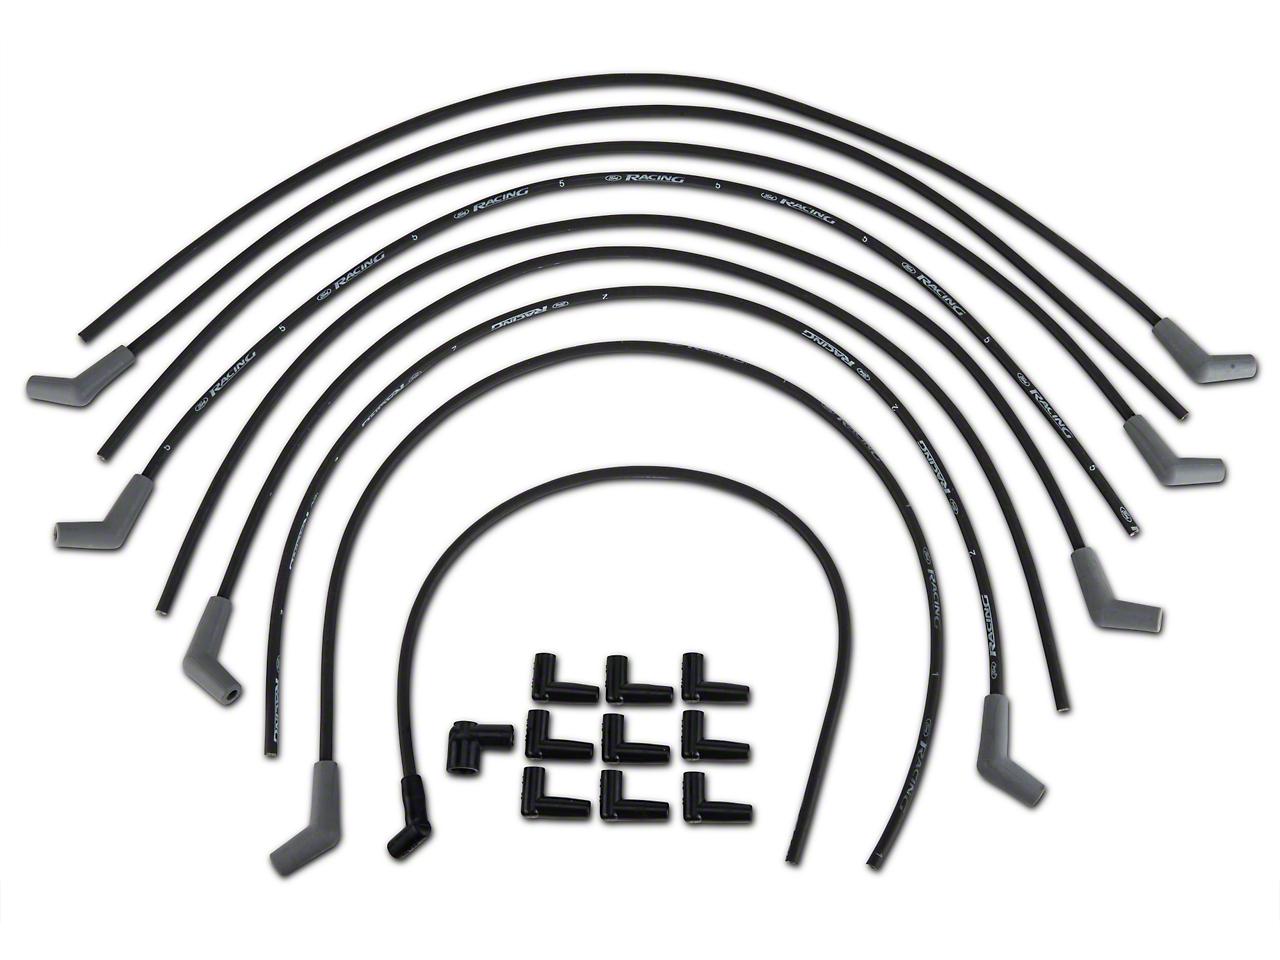 Ford Performance High Performance 9mm Spark Plug Wires - Black (79-95 V6, V8)